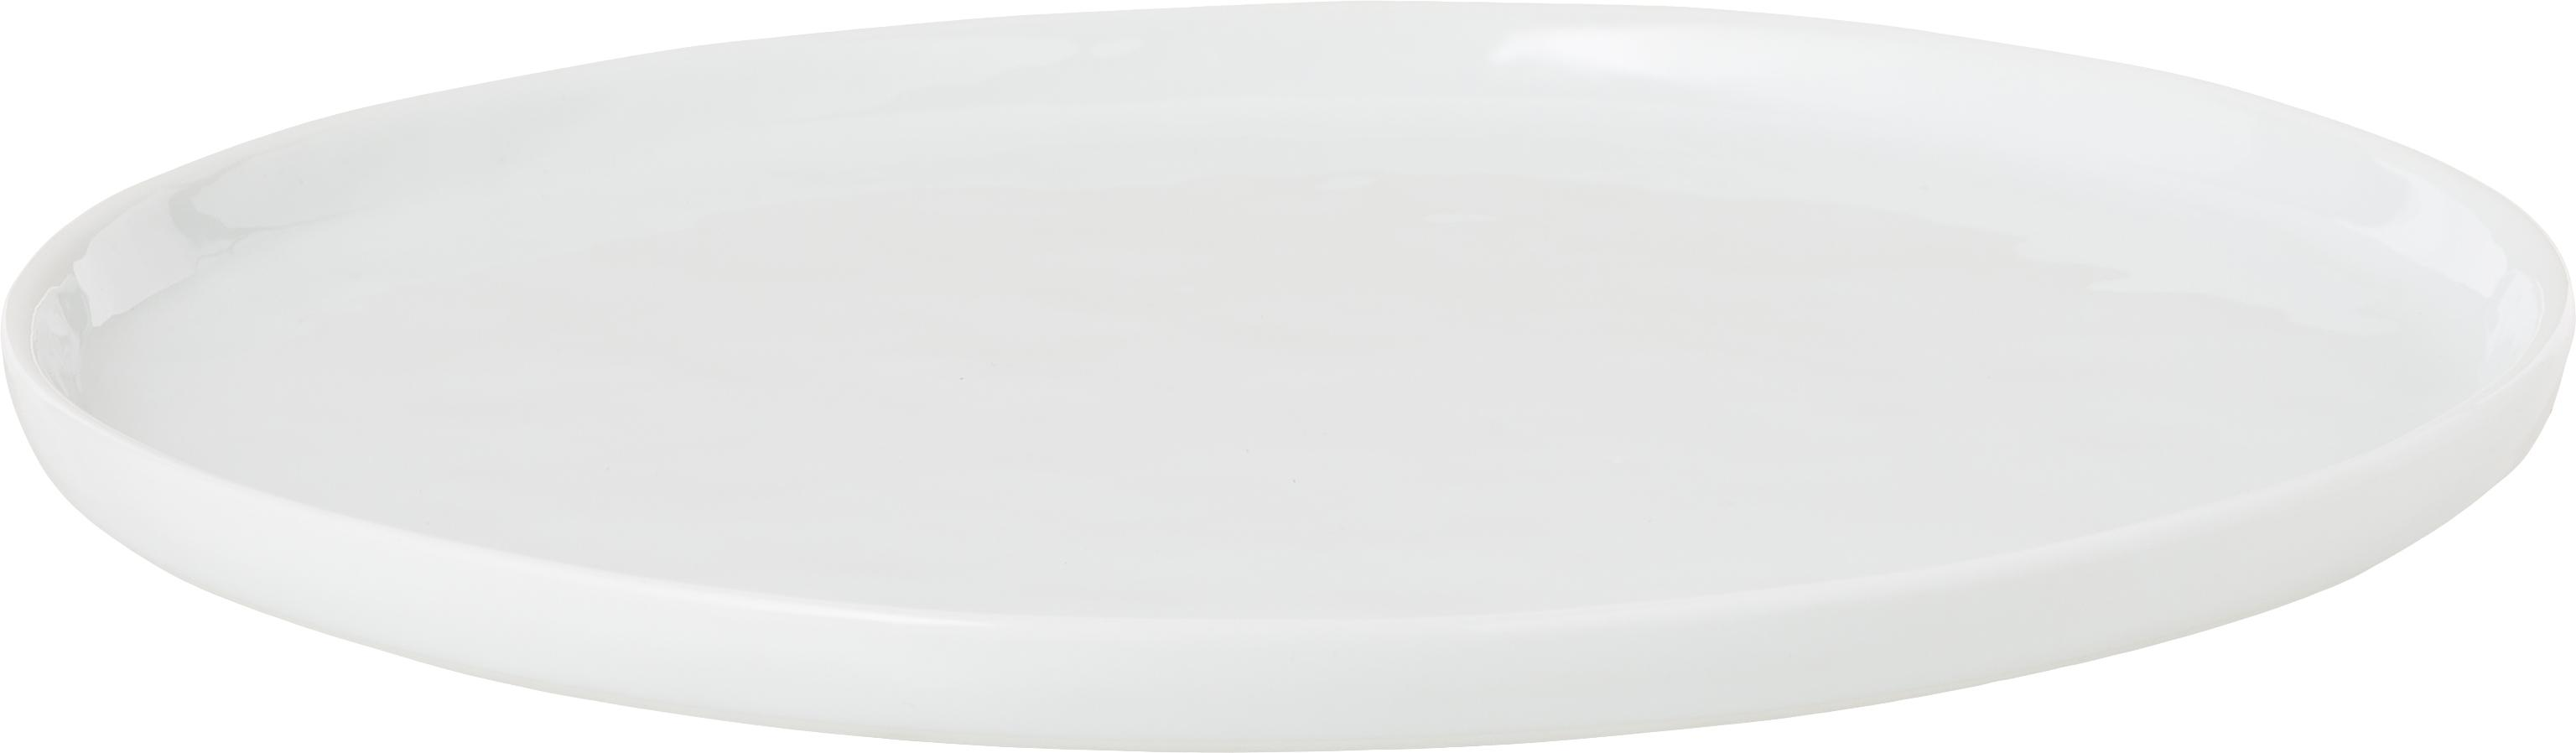 Piattino da dessert Porcelino 4 pz, Porcellana, volutamente irregolare, Bianco, Ø 22 cm